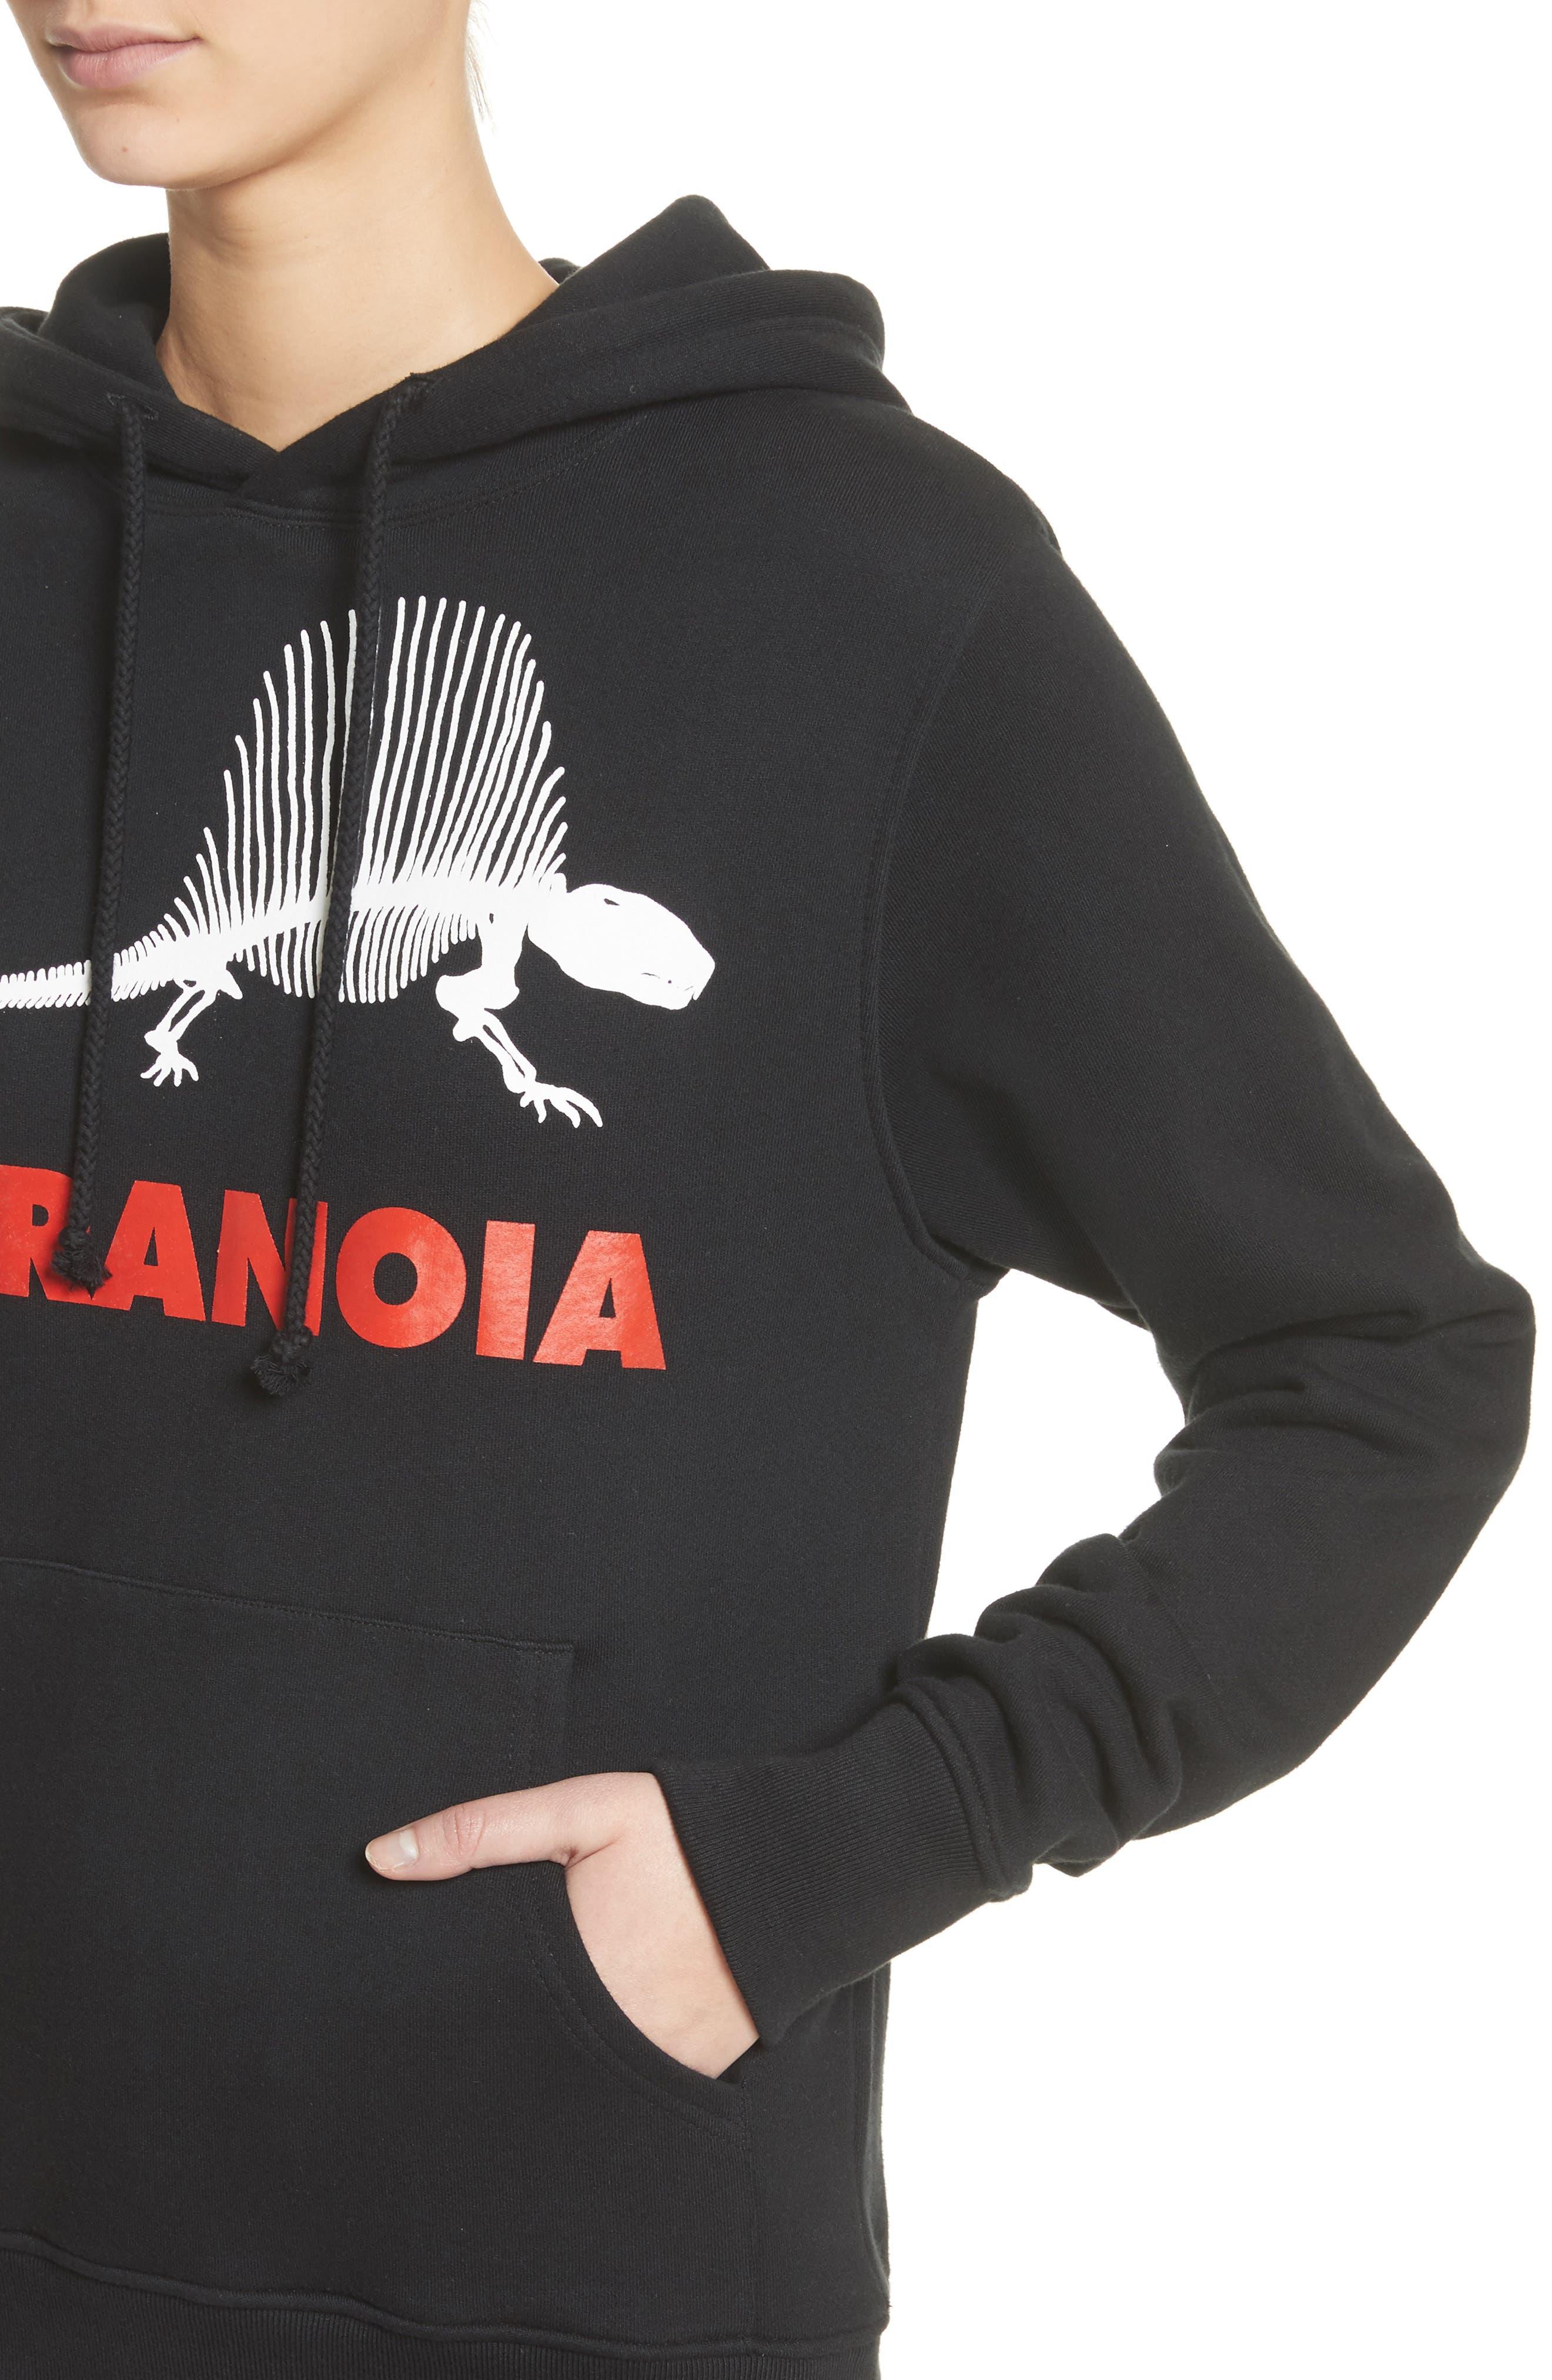 Paranoia Hoodie,                             Alternate thumbnail 4, color,                             001